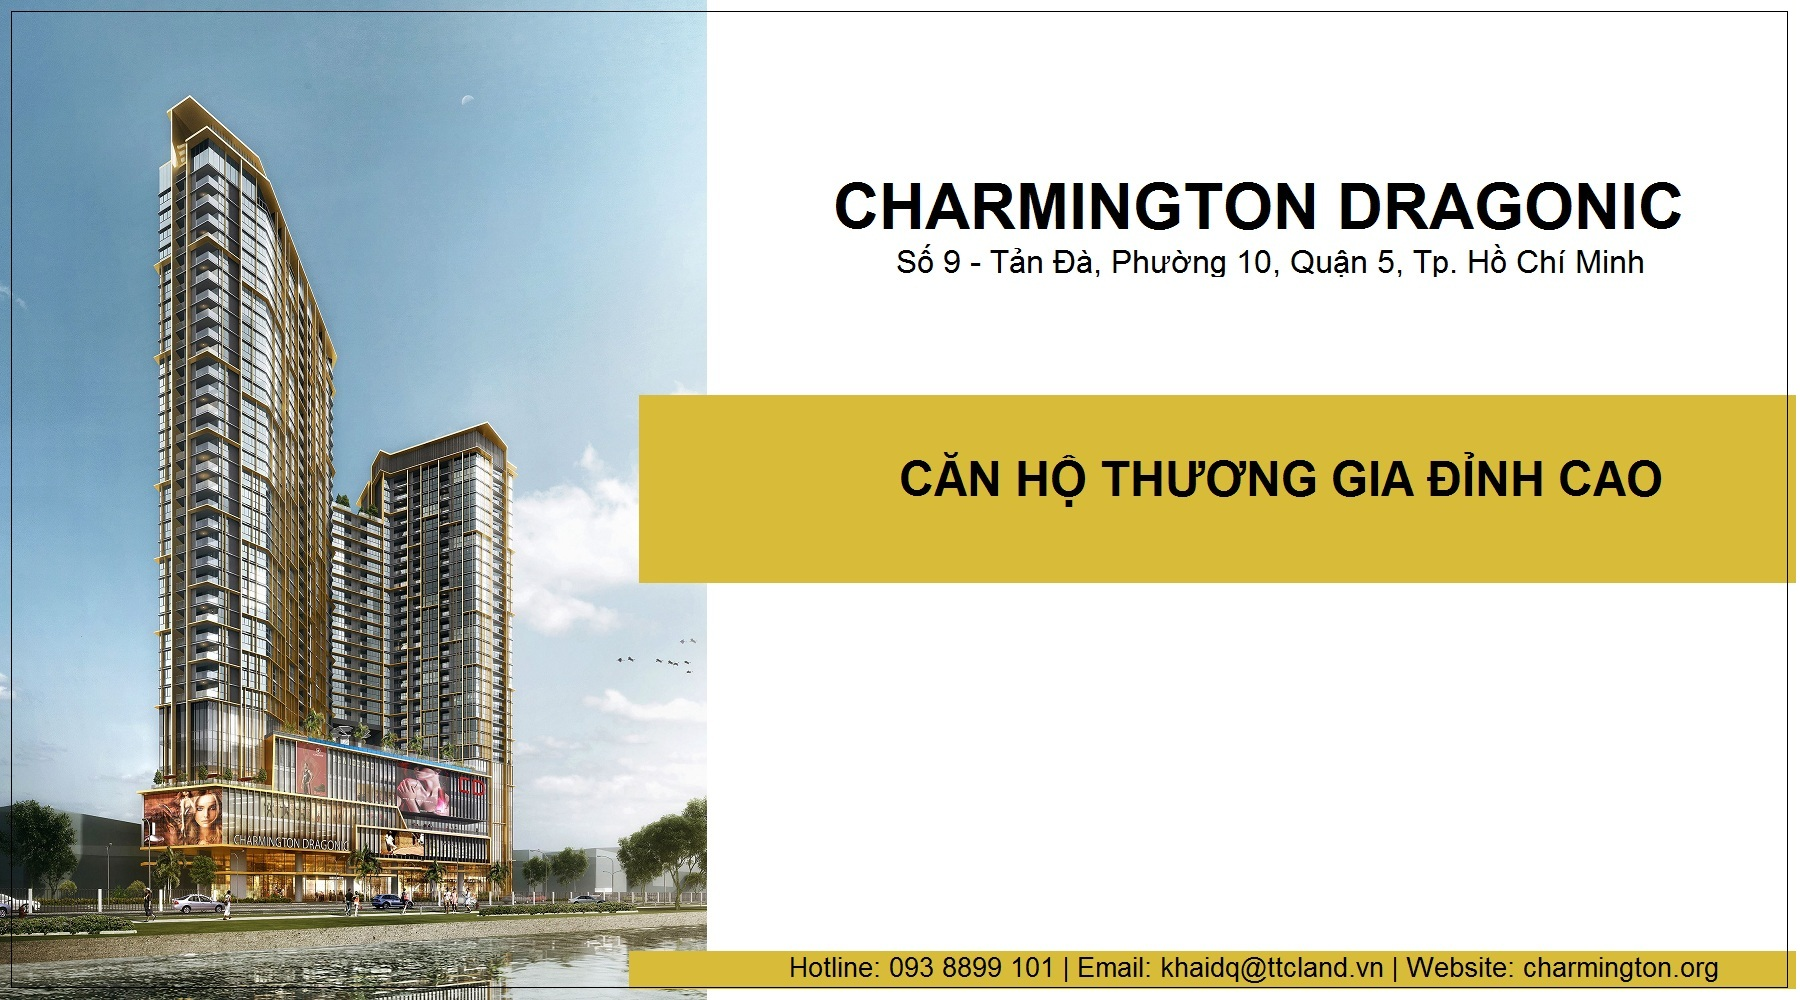 Charmington Dragonic